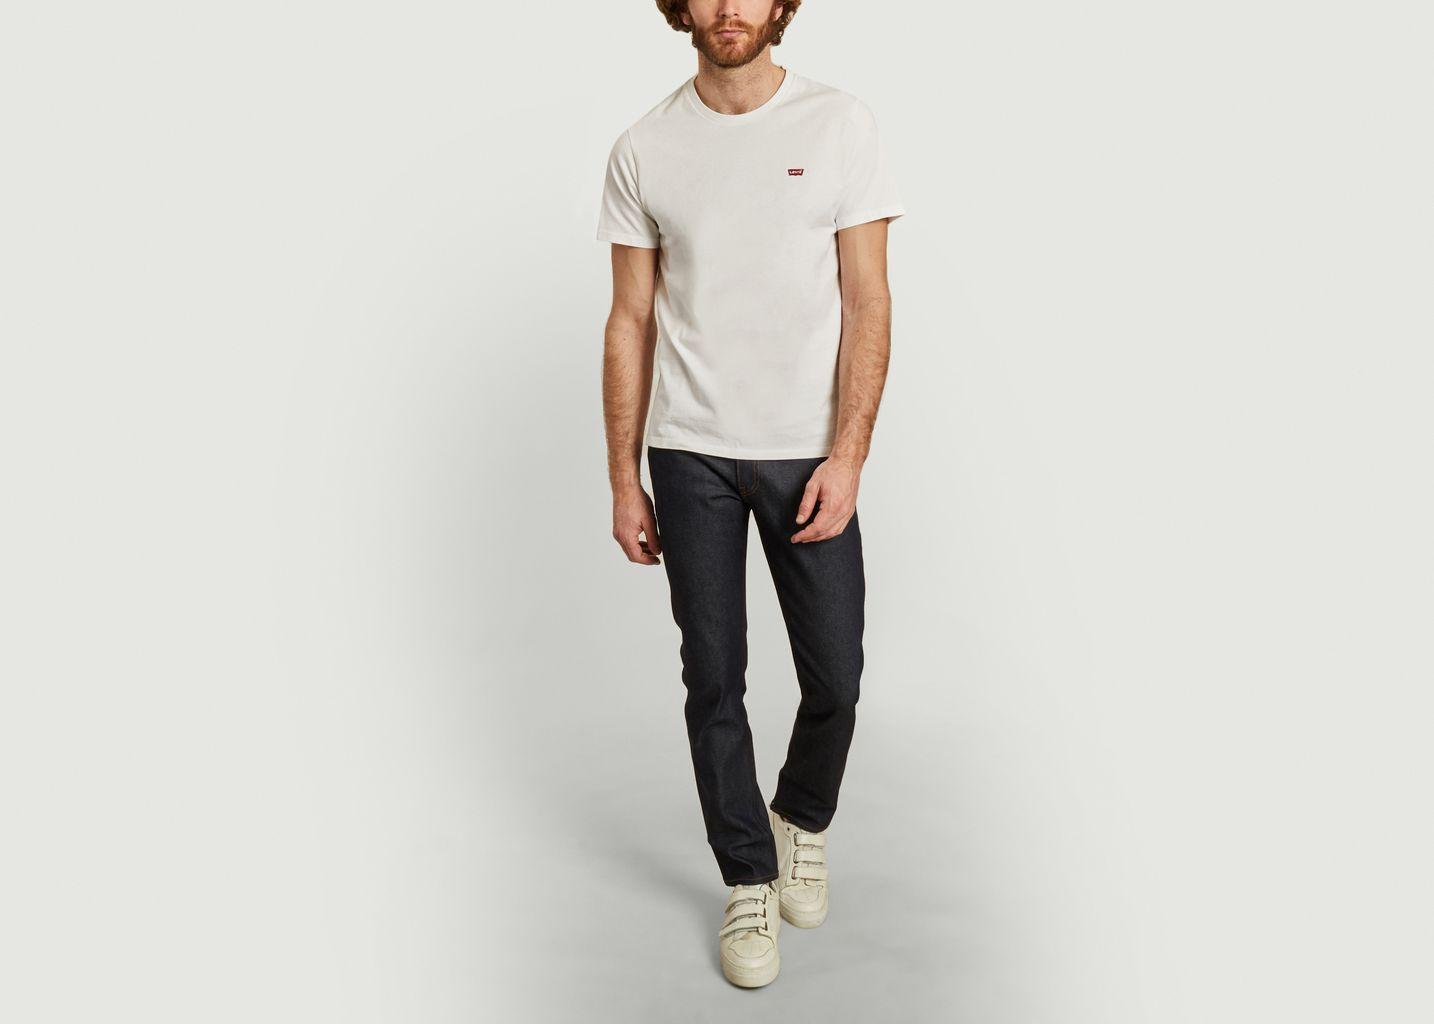 Jeans 511 selvedge - Levi's M&C